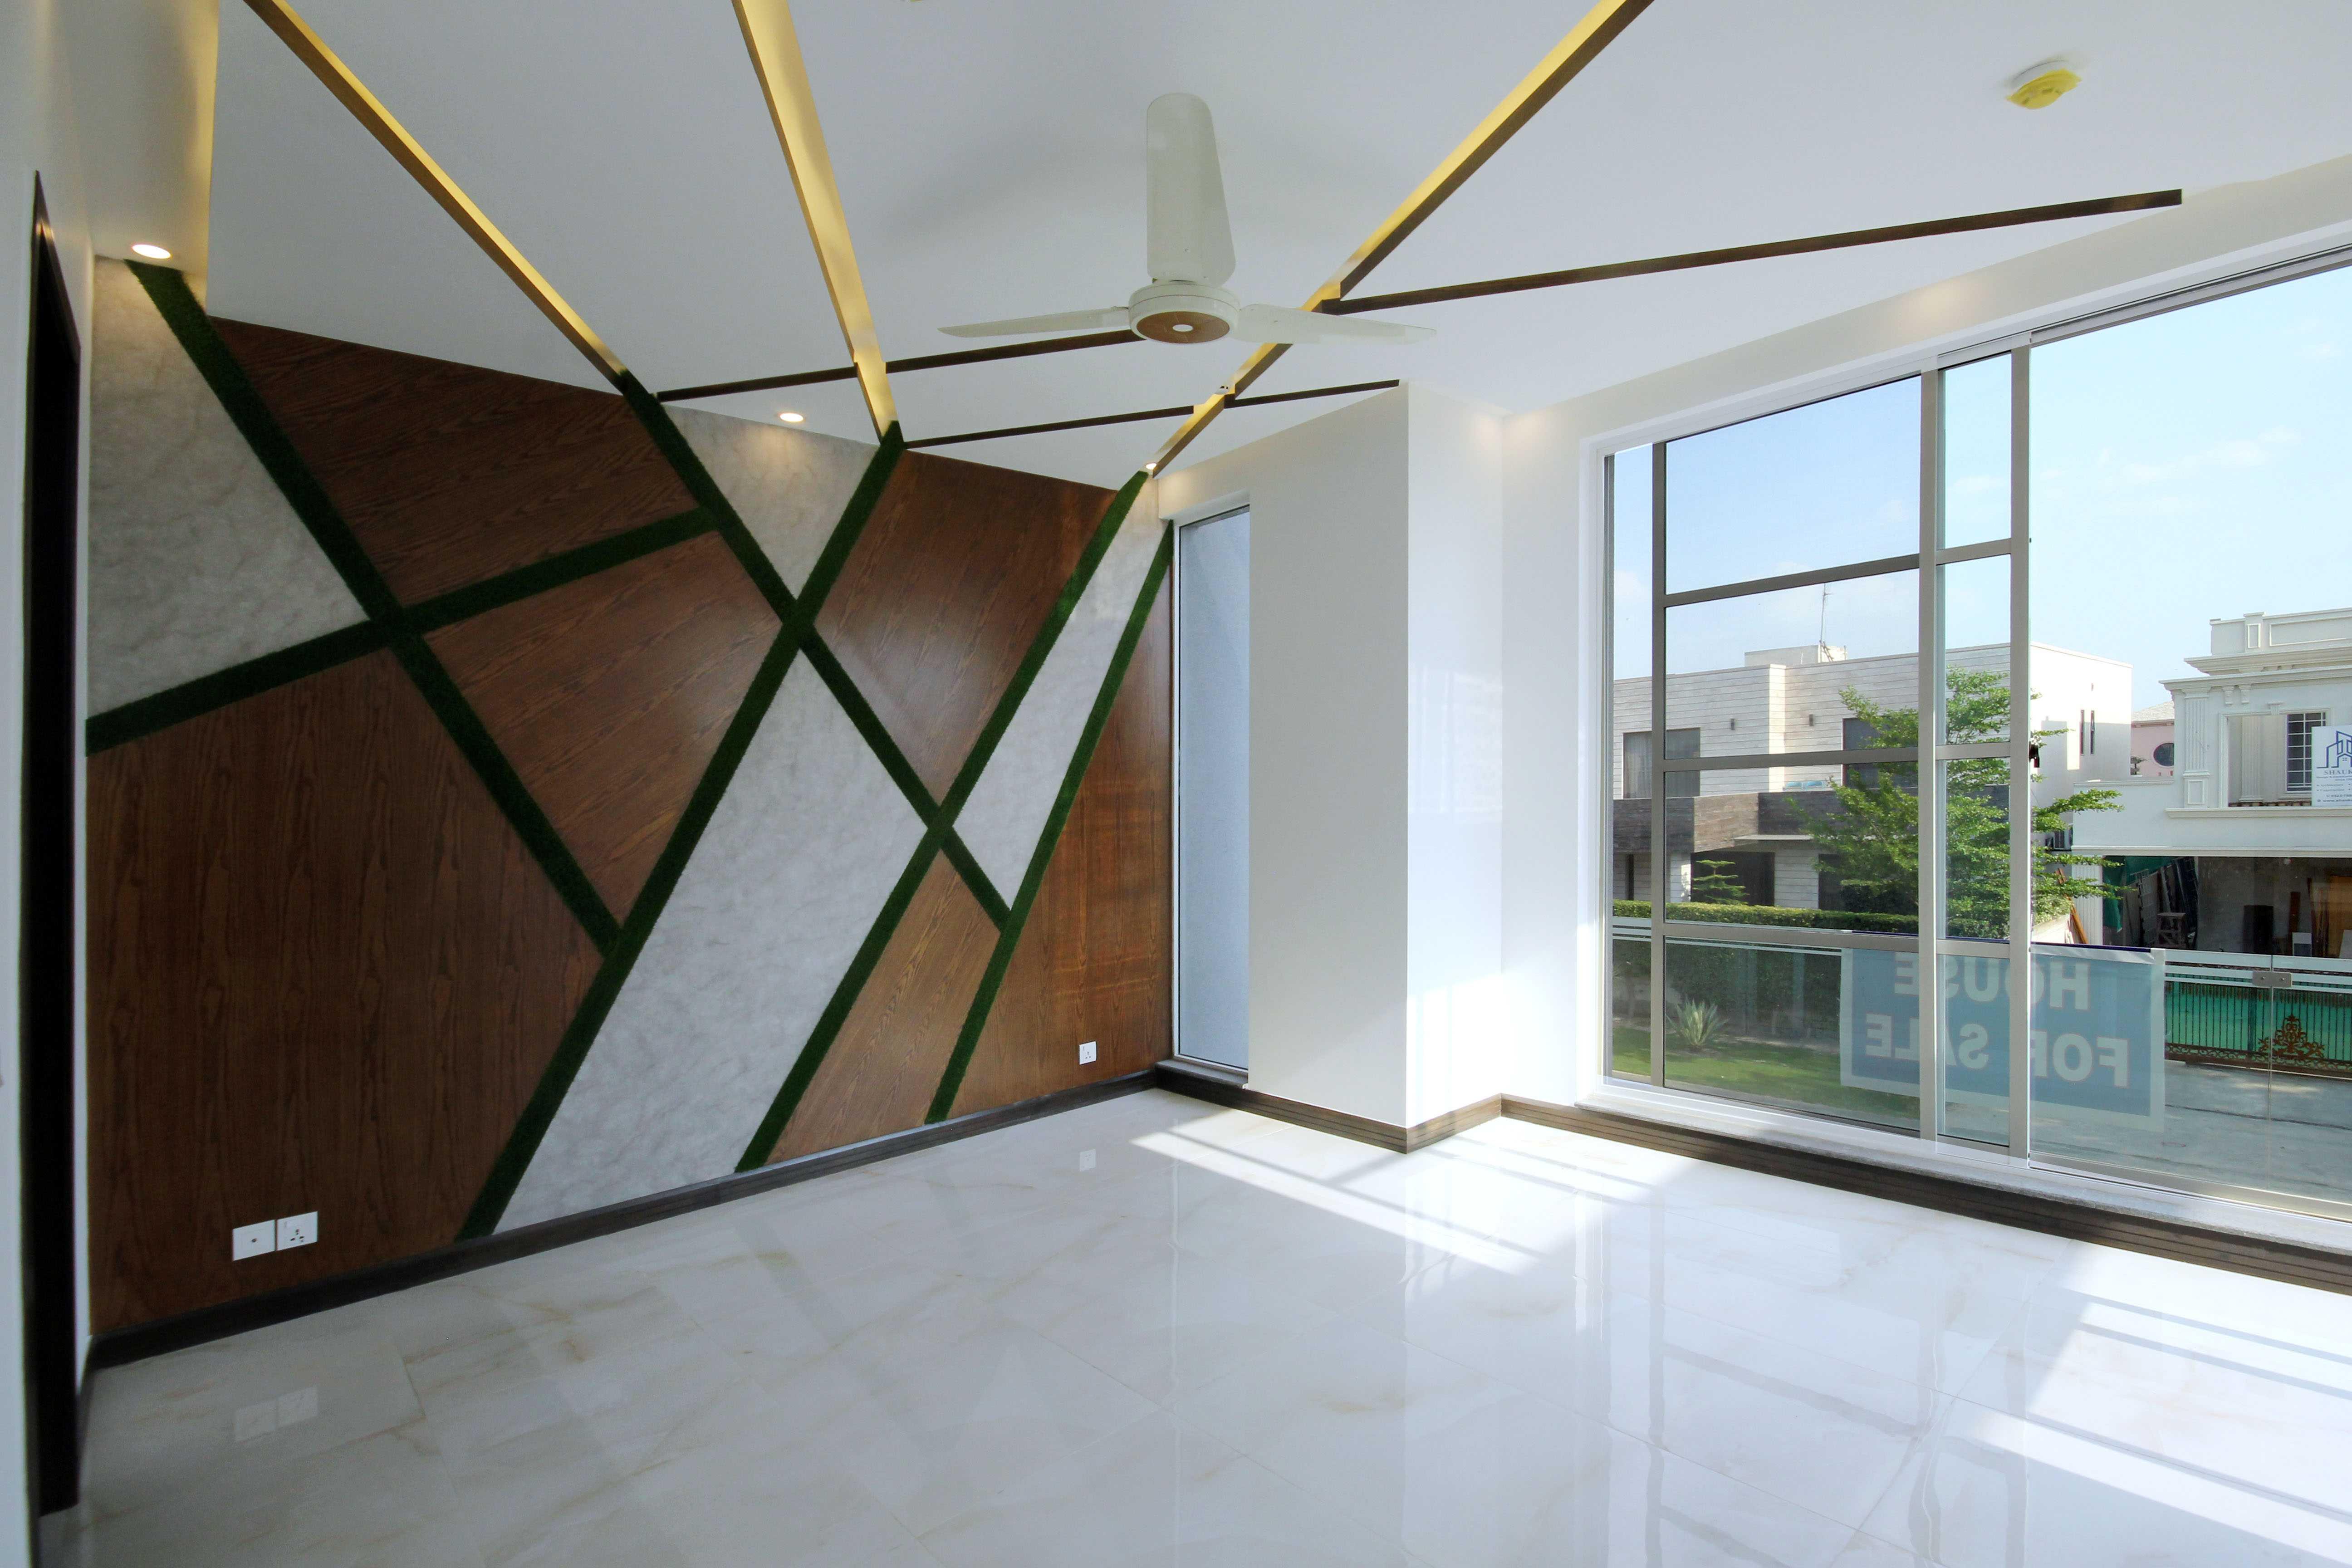 1 kanal remarkable design house DHA Phase 6